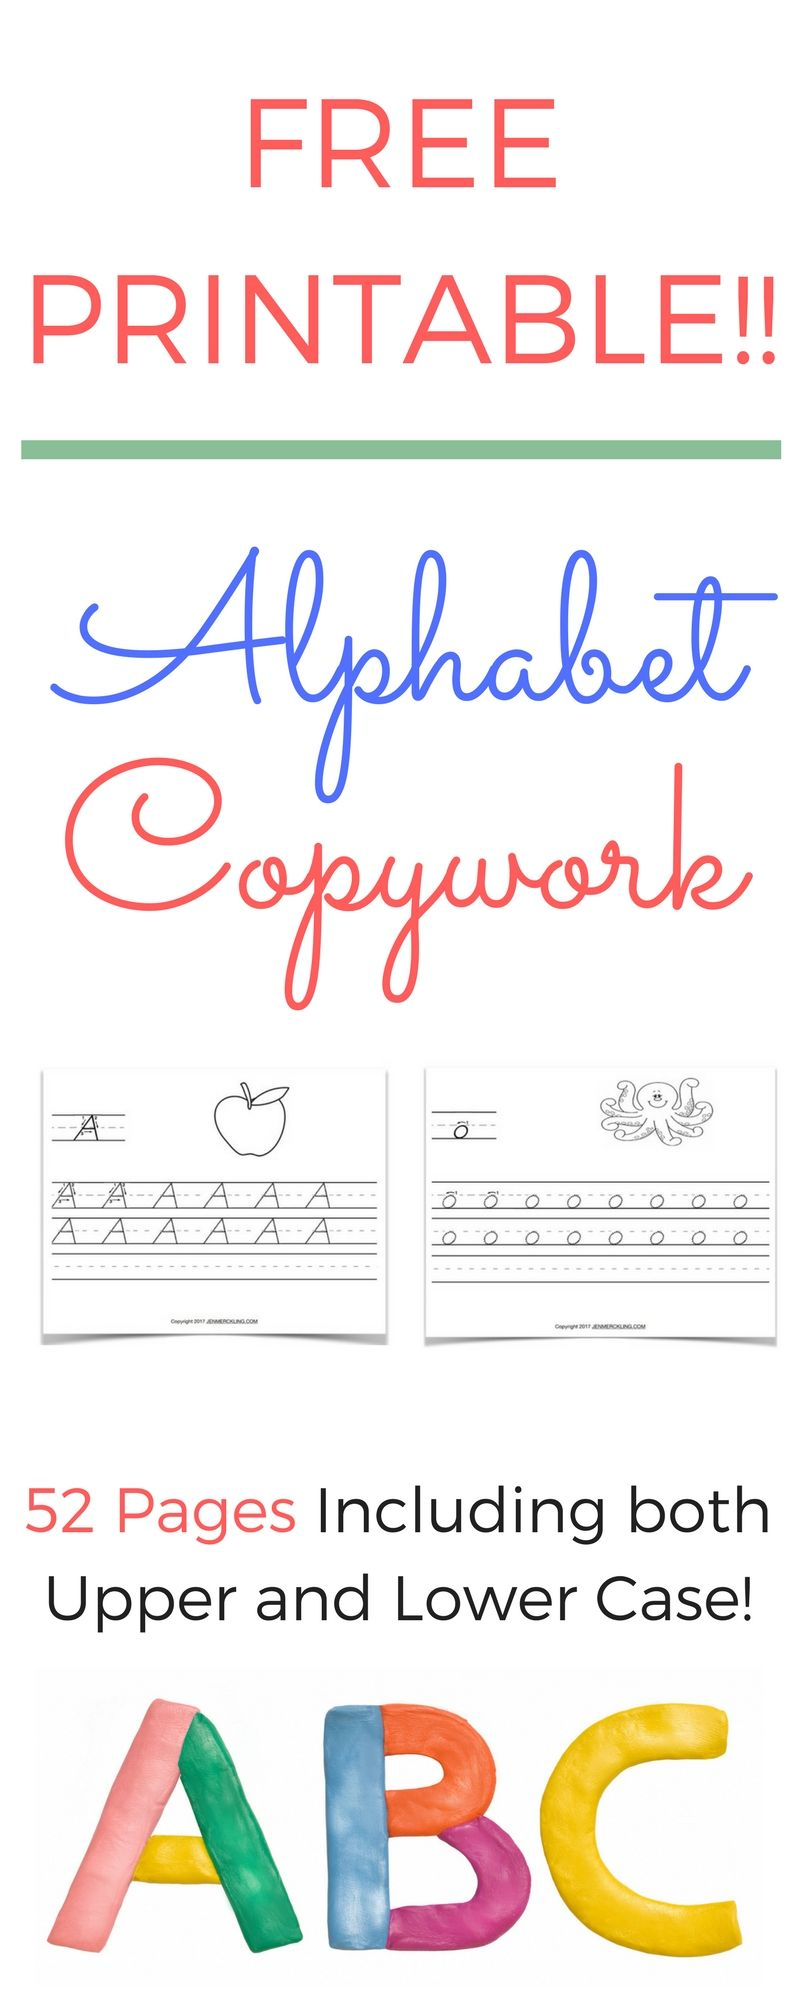 Free Handwriting Worksheets For Kids Free Handwriting Worksheets Handwriting Worksheets For Kids Free Handwriting